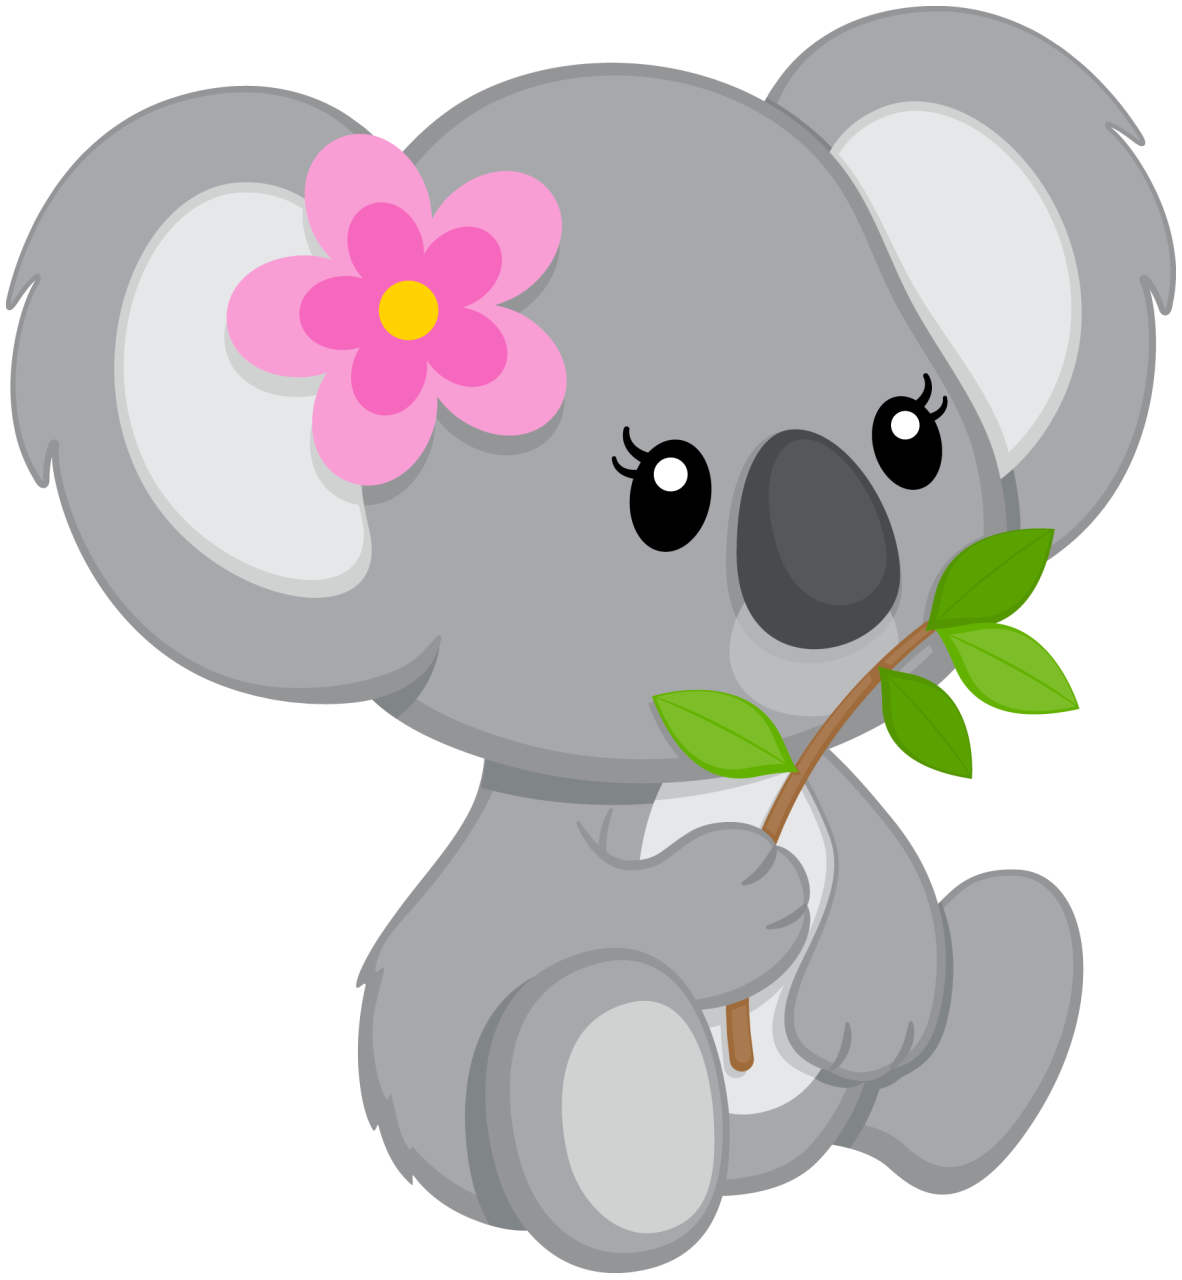 Pin by sylvia jensen. Clipart animals koala